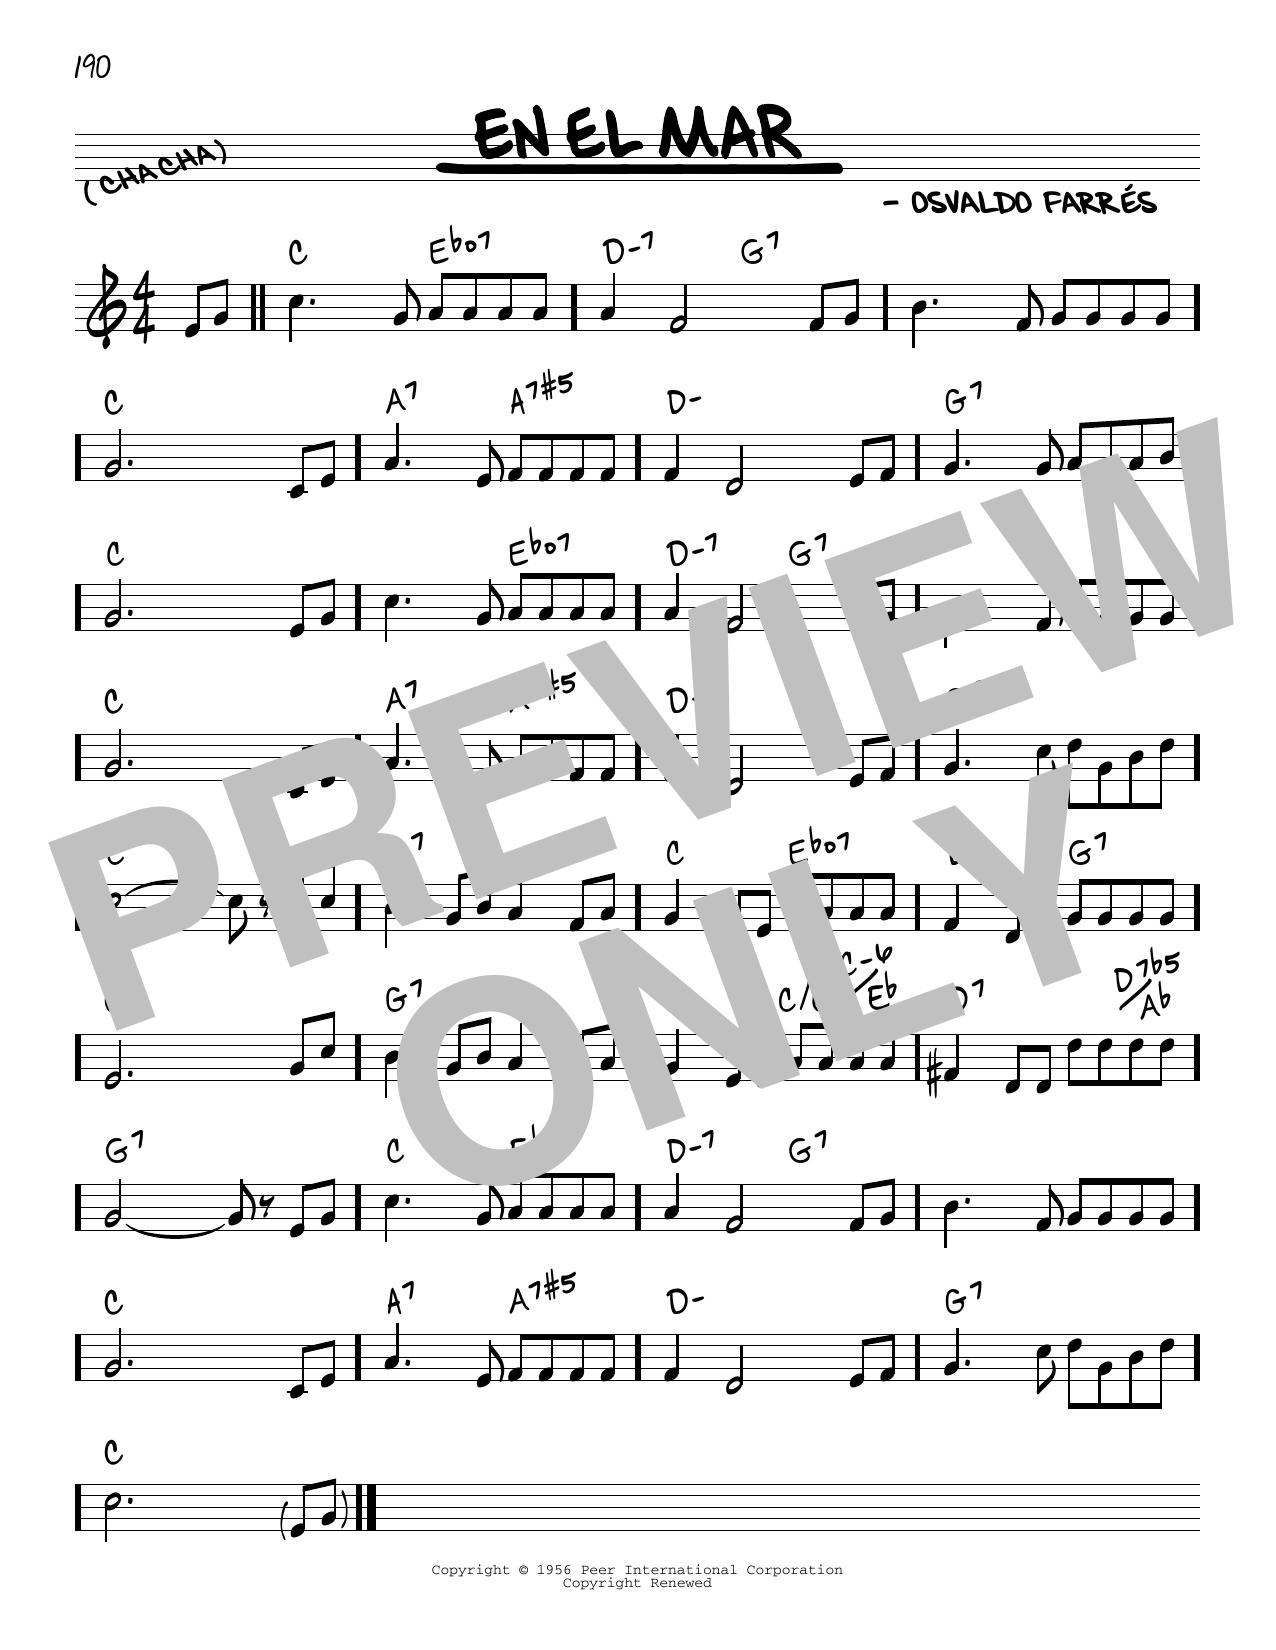 Osvaldo Farres En El Mar sheet music notes and chords. Download Printable PDF.